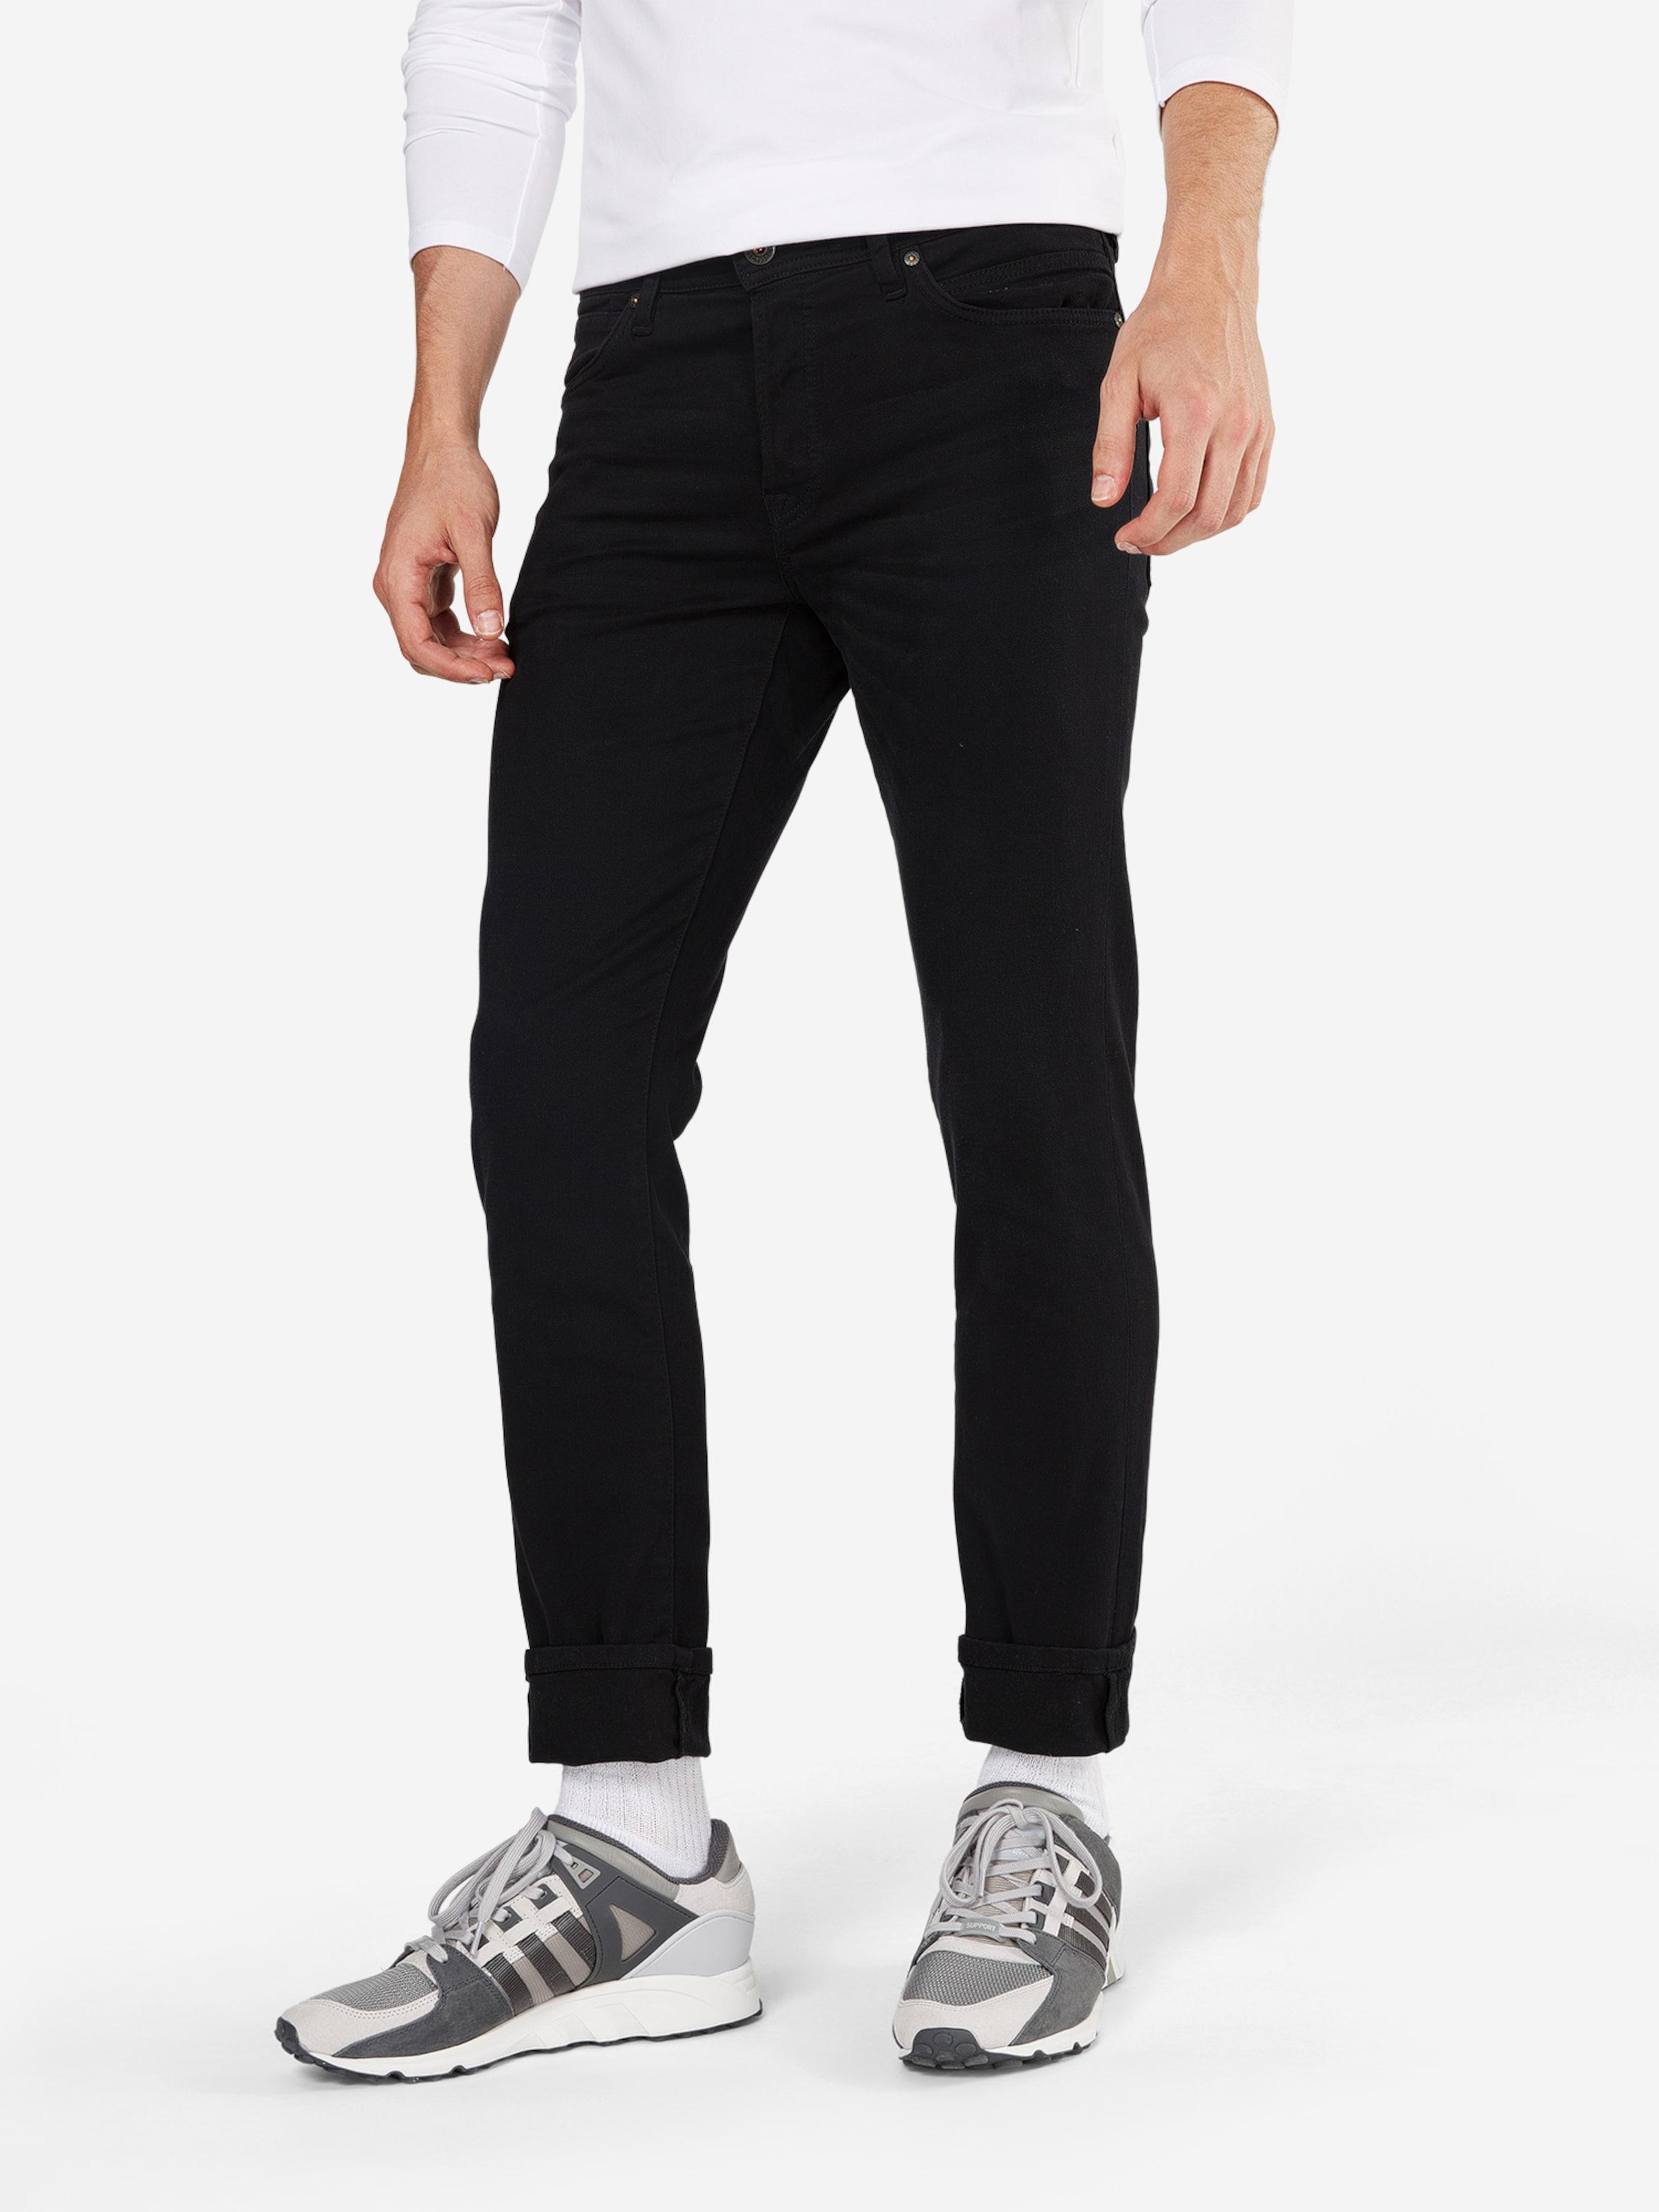 Günstig Kaufen Wahl Outlet Rabatt JACK & JONES Jeans 'JJIGLENN JJFOX AKM 360 INDI K BLACK NOOS' AFCEOH0